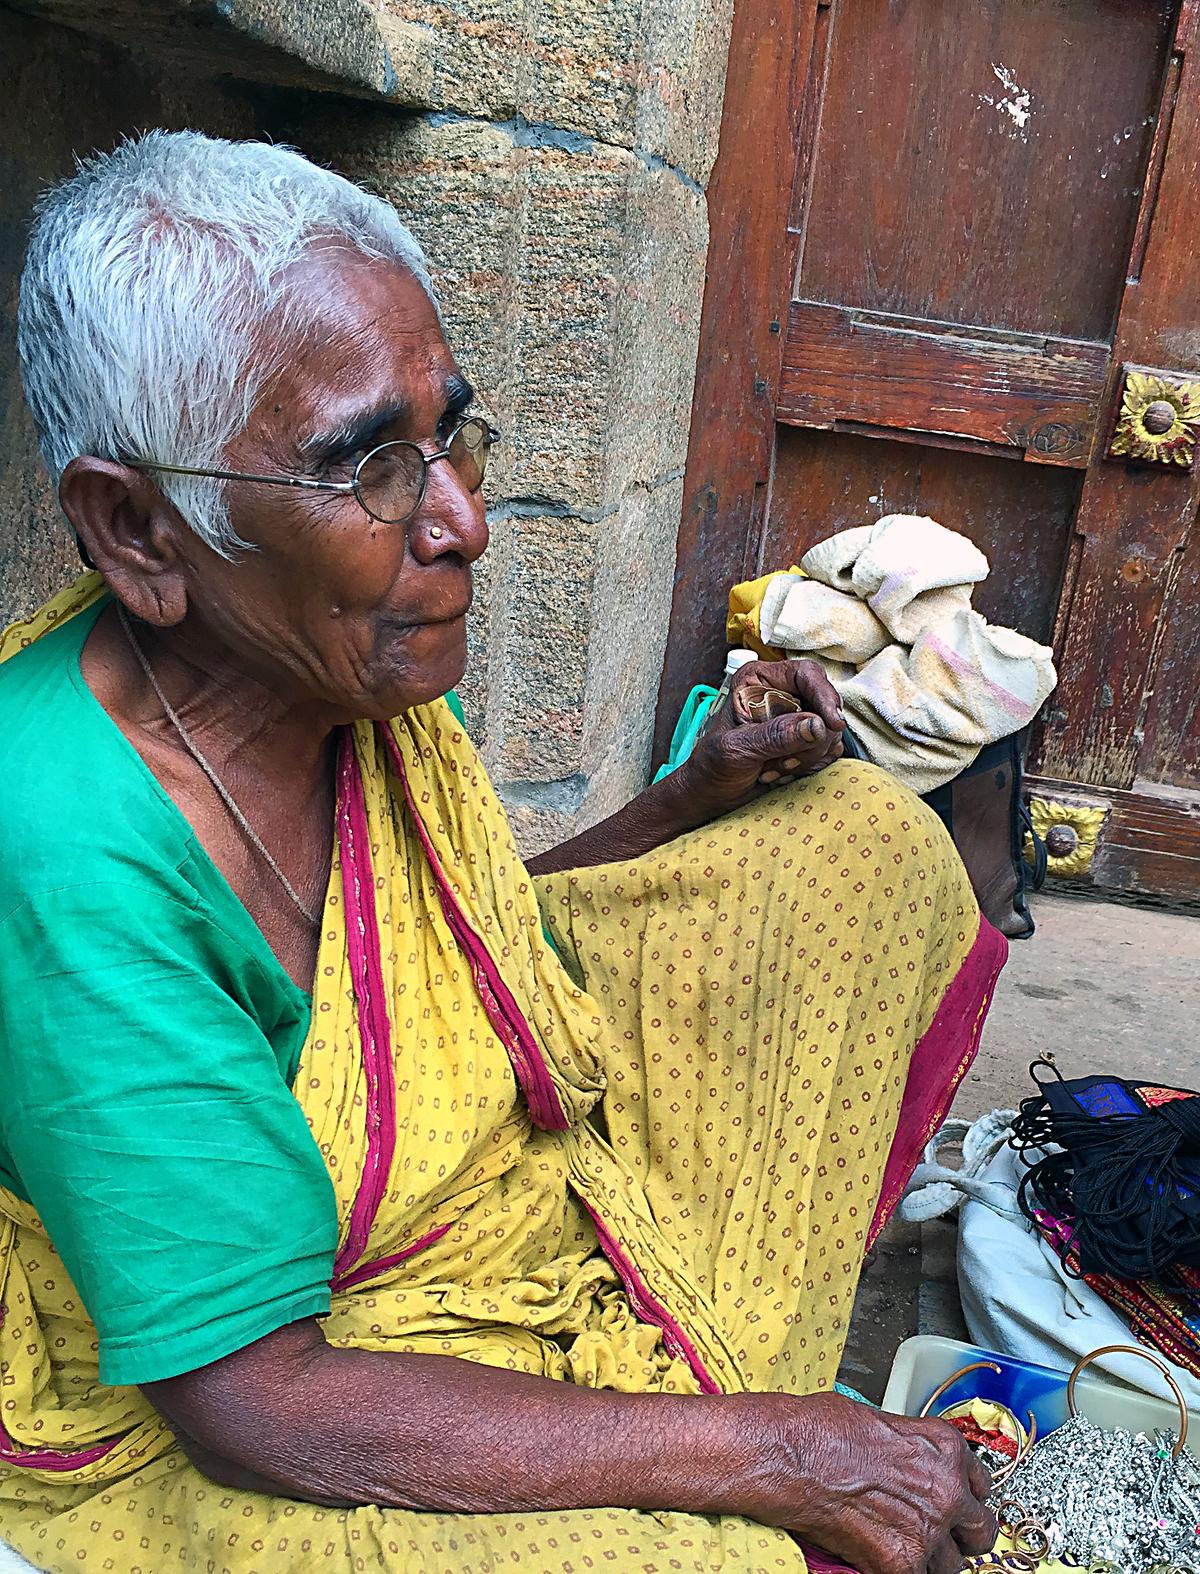 INDIEN Chennai Kanchipuram Tempel Menschen Tempel FINEST-onTour 2135.jpg